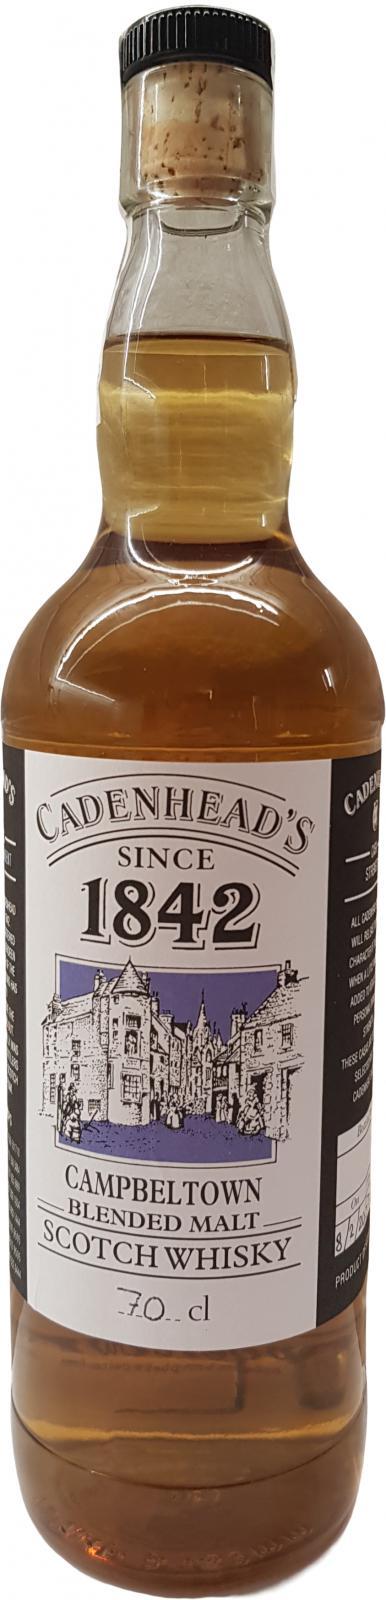 Cadenheads Campbeltown Blended Malt